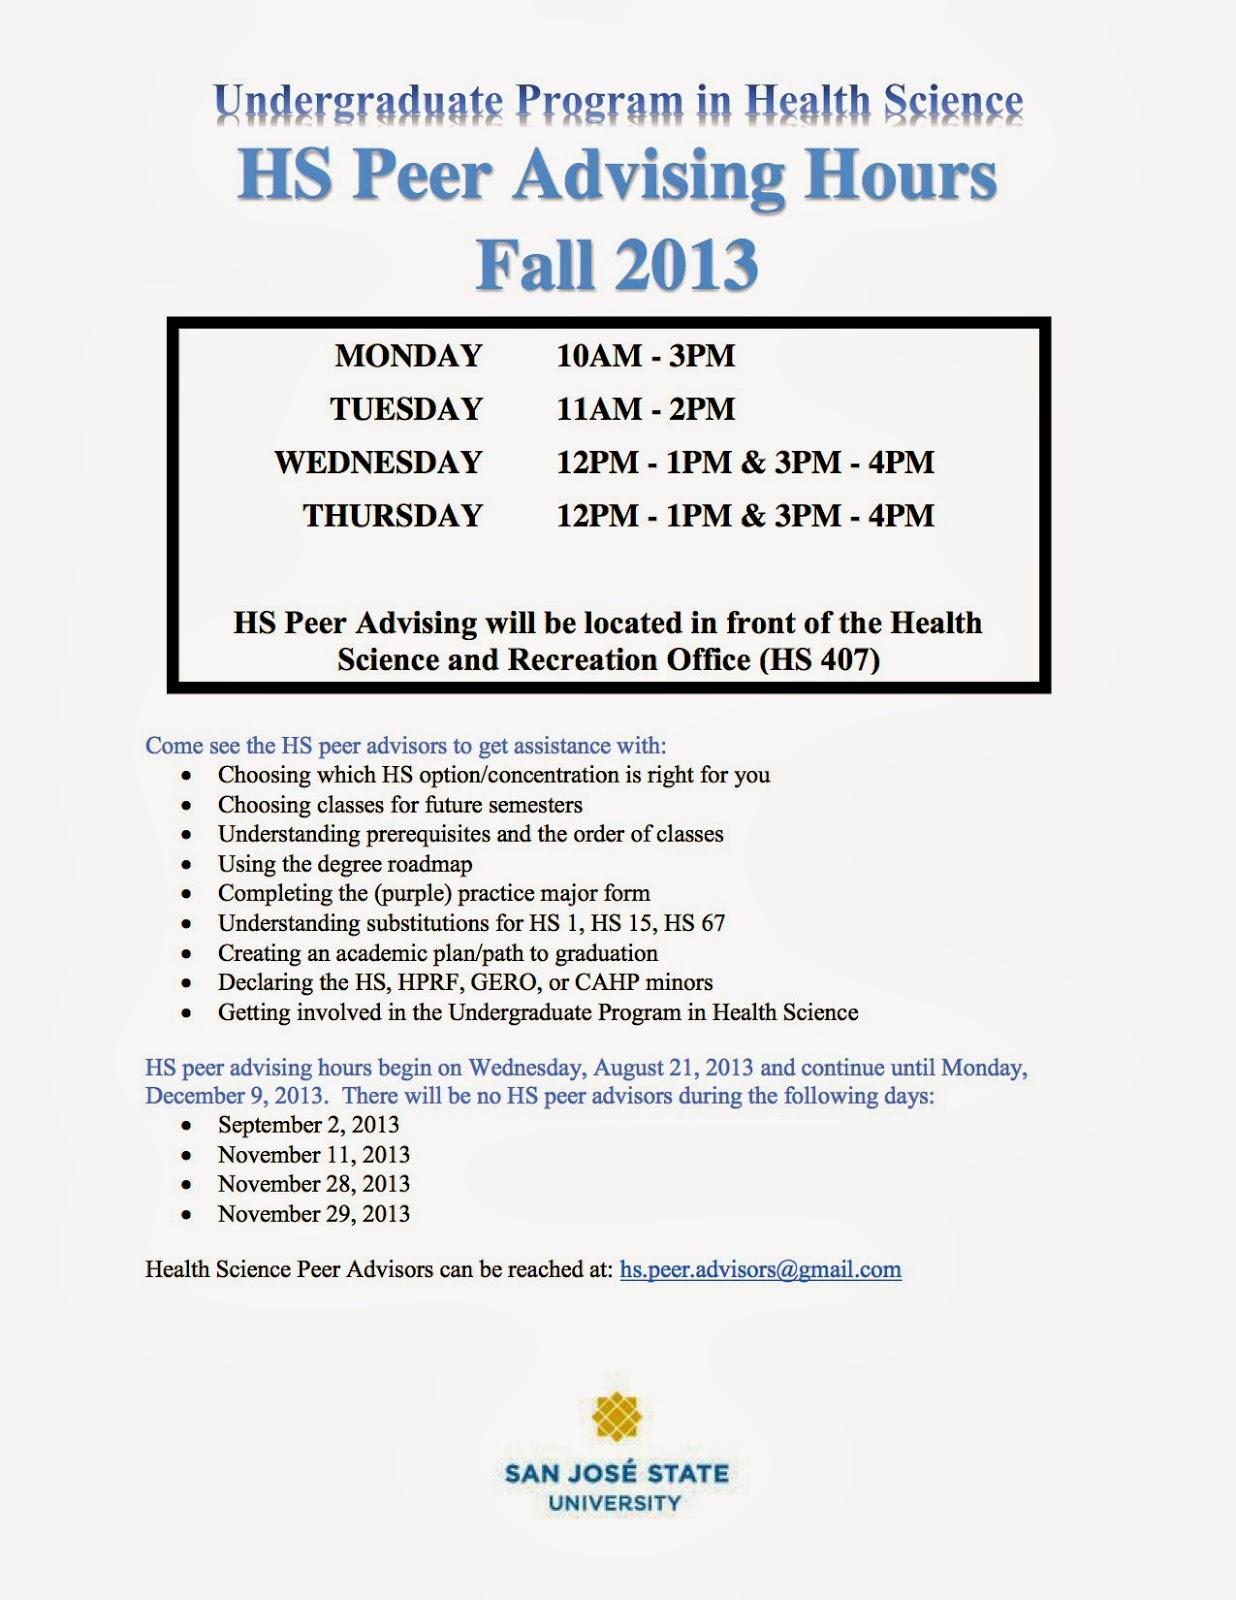 SJSU Health Science Advising: October 2013